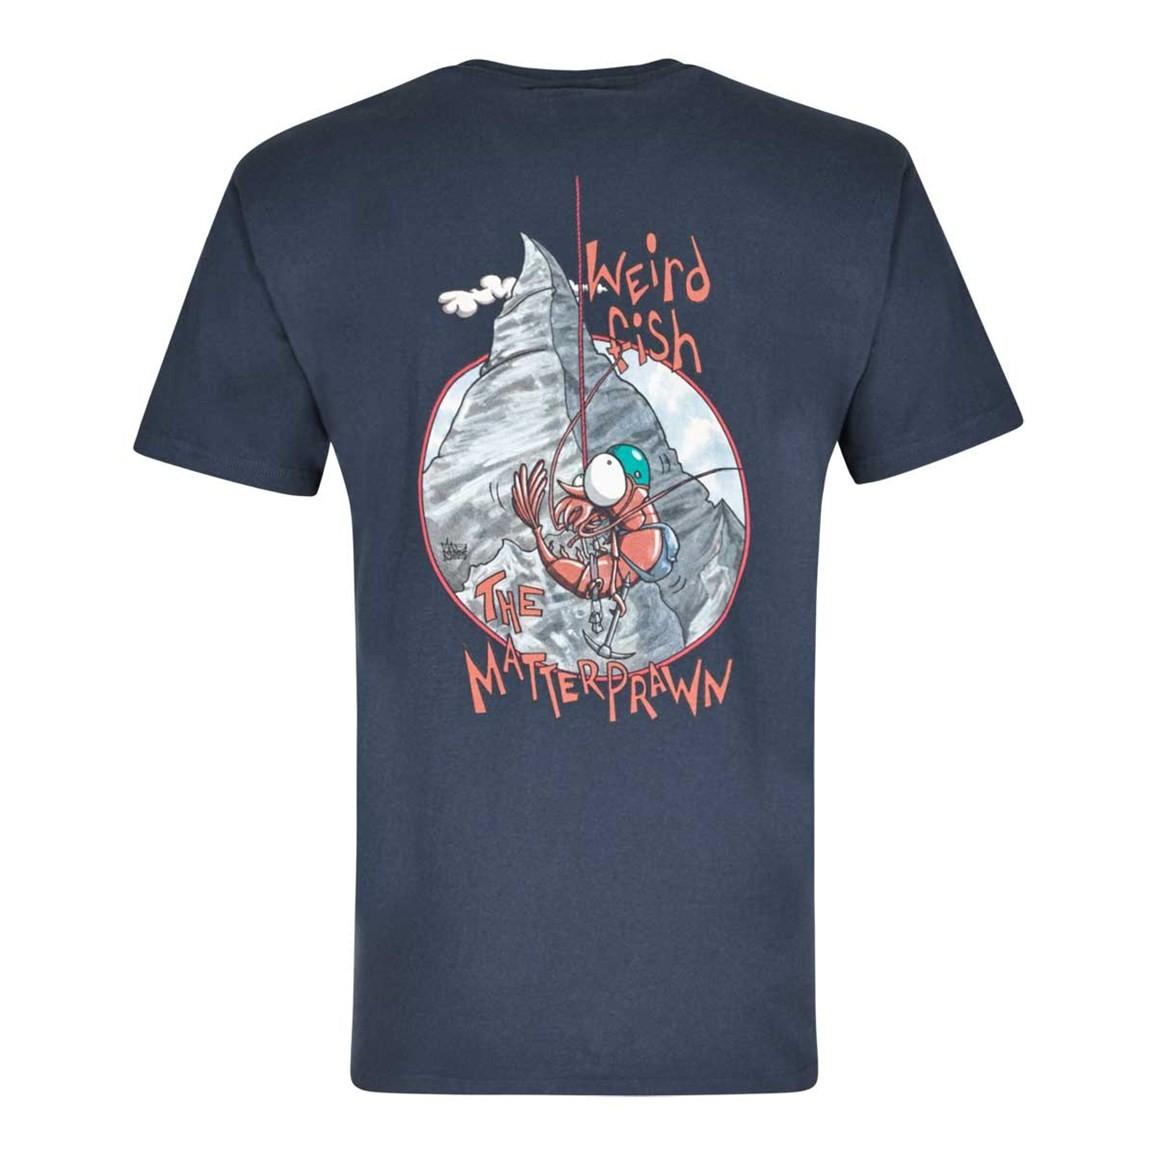 Image of Weird Fish Matterprawn Printed Artist T-Shirt Dark Navy Size M